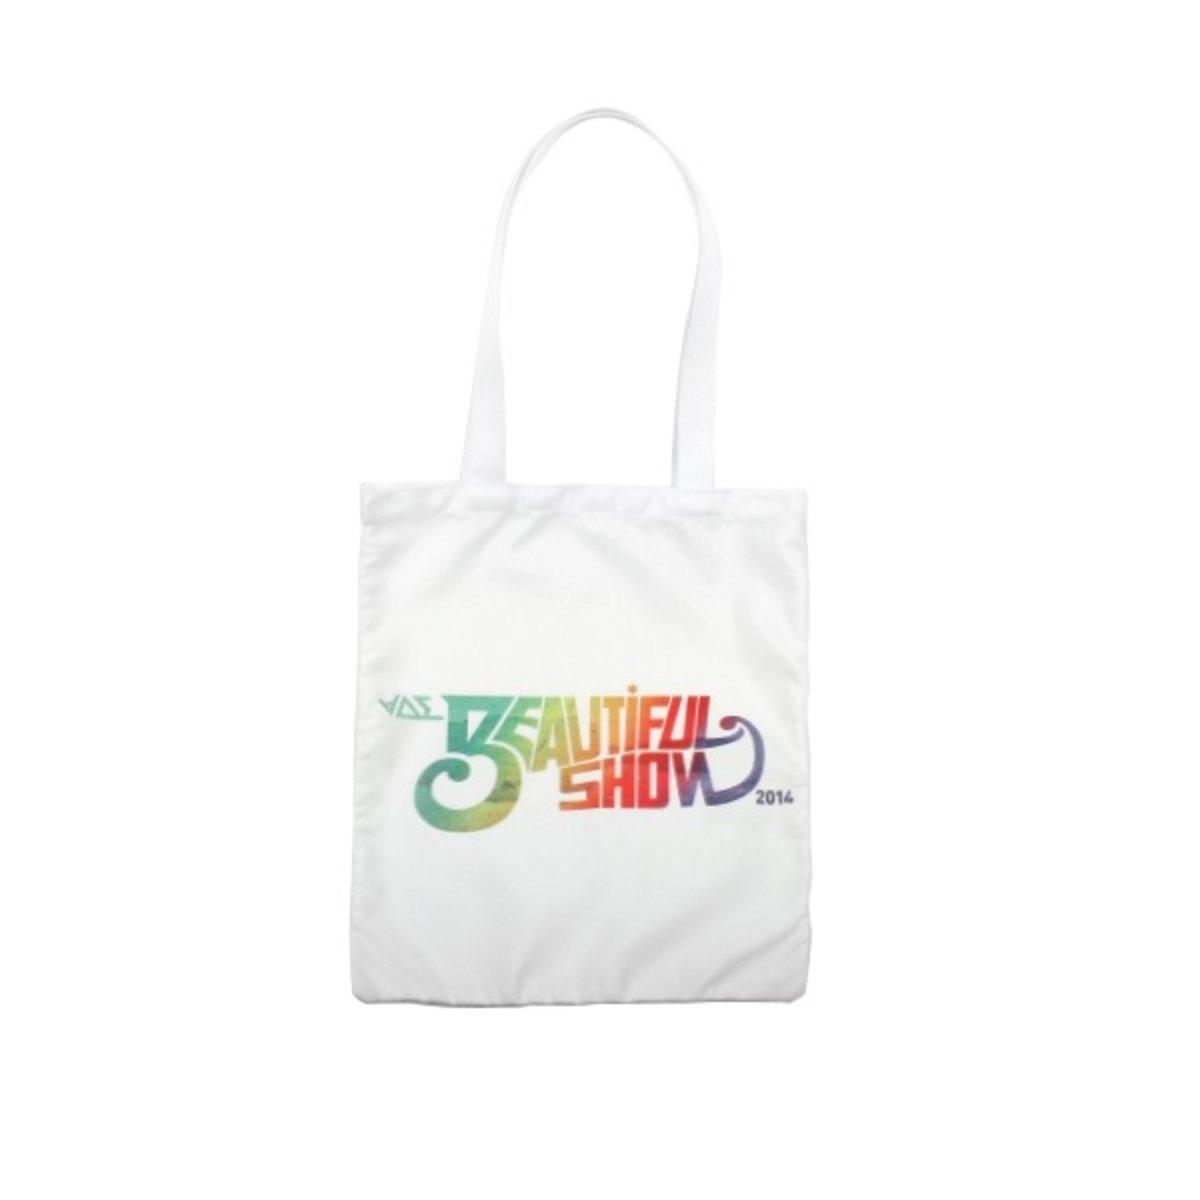 BEAST- 環保袋[BEAUTIFUL SHOW 2014]_GD00012895